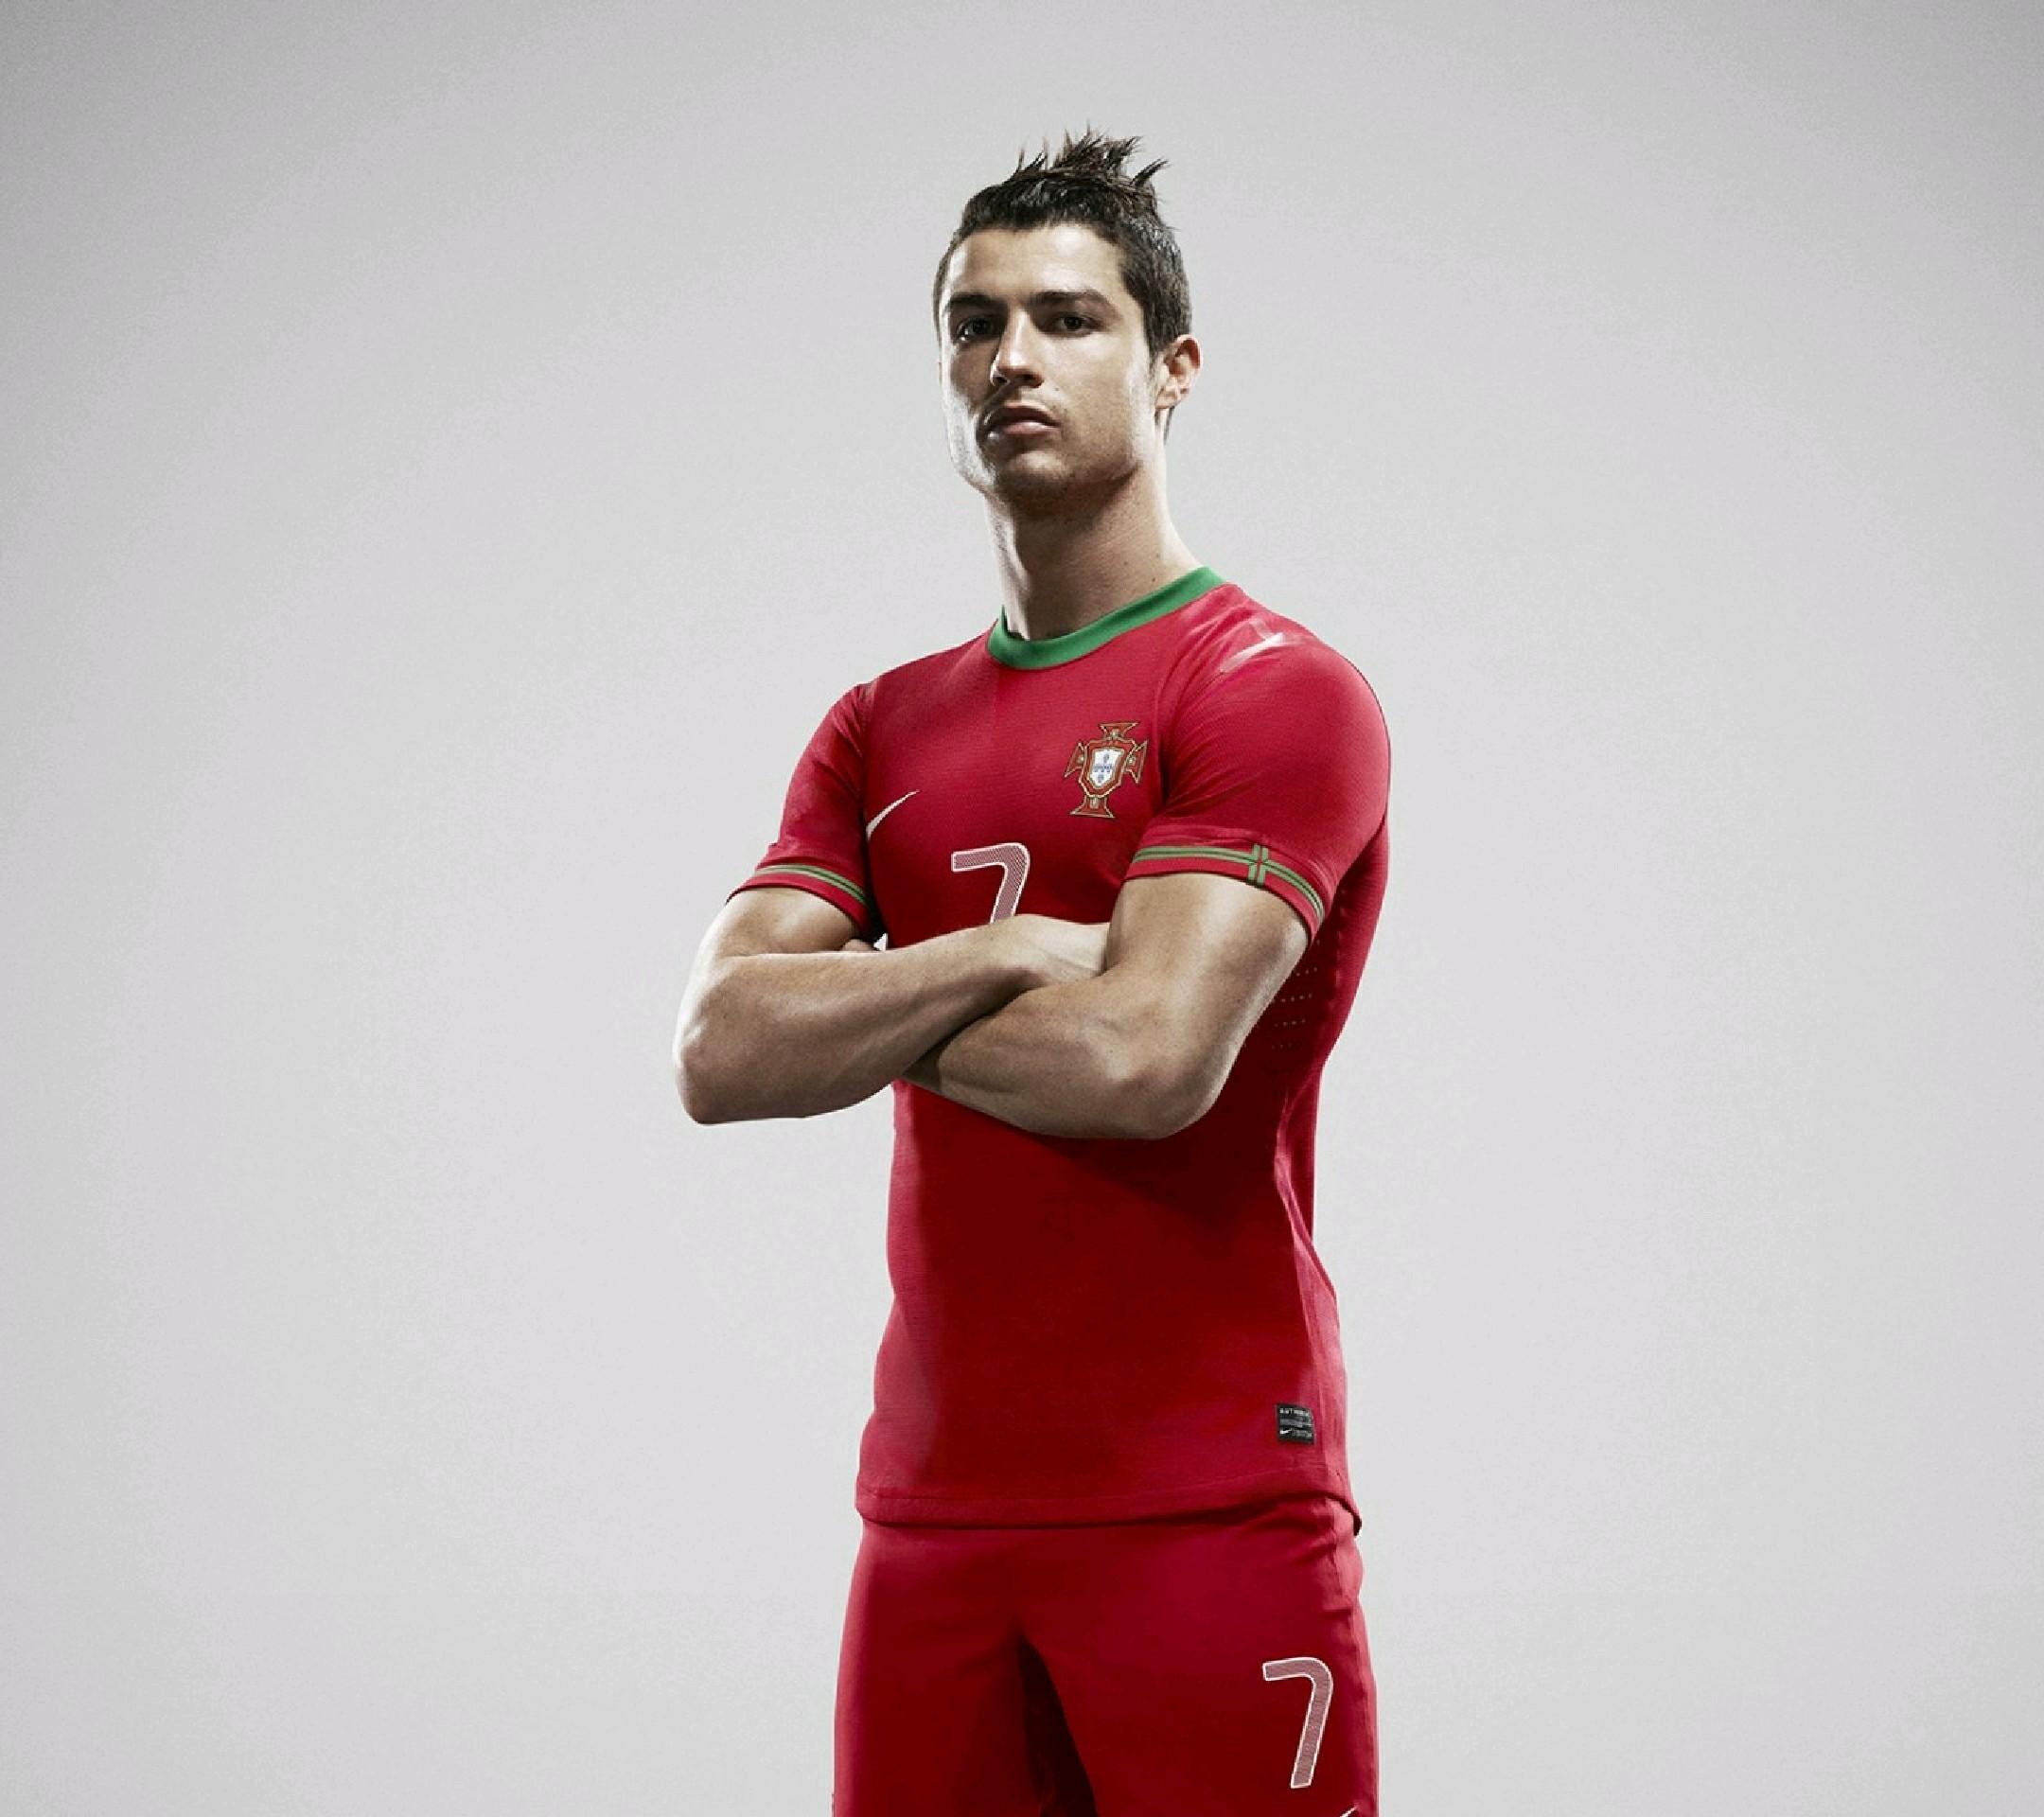 【v粉主题素材壁纸】葡萄牙足球巨星-c罗